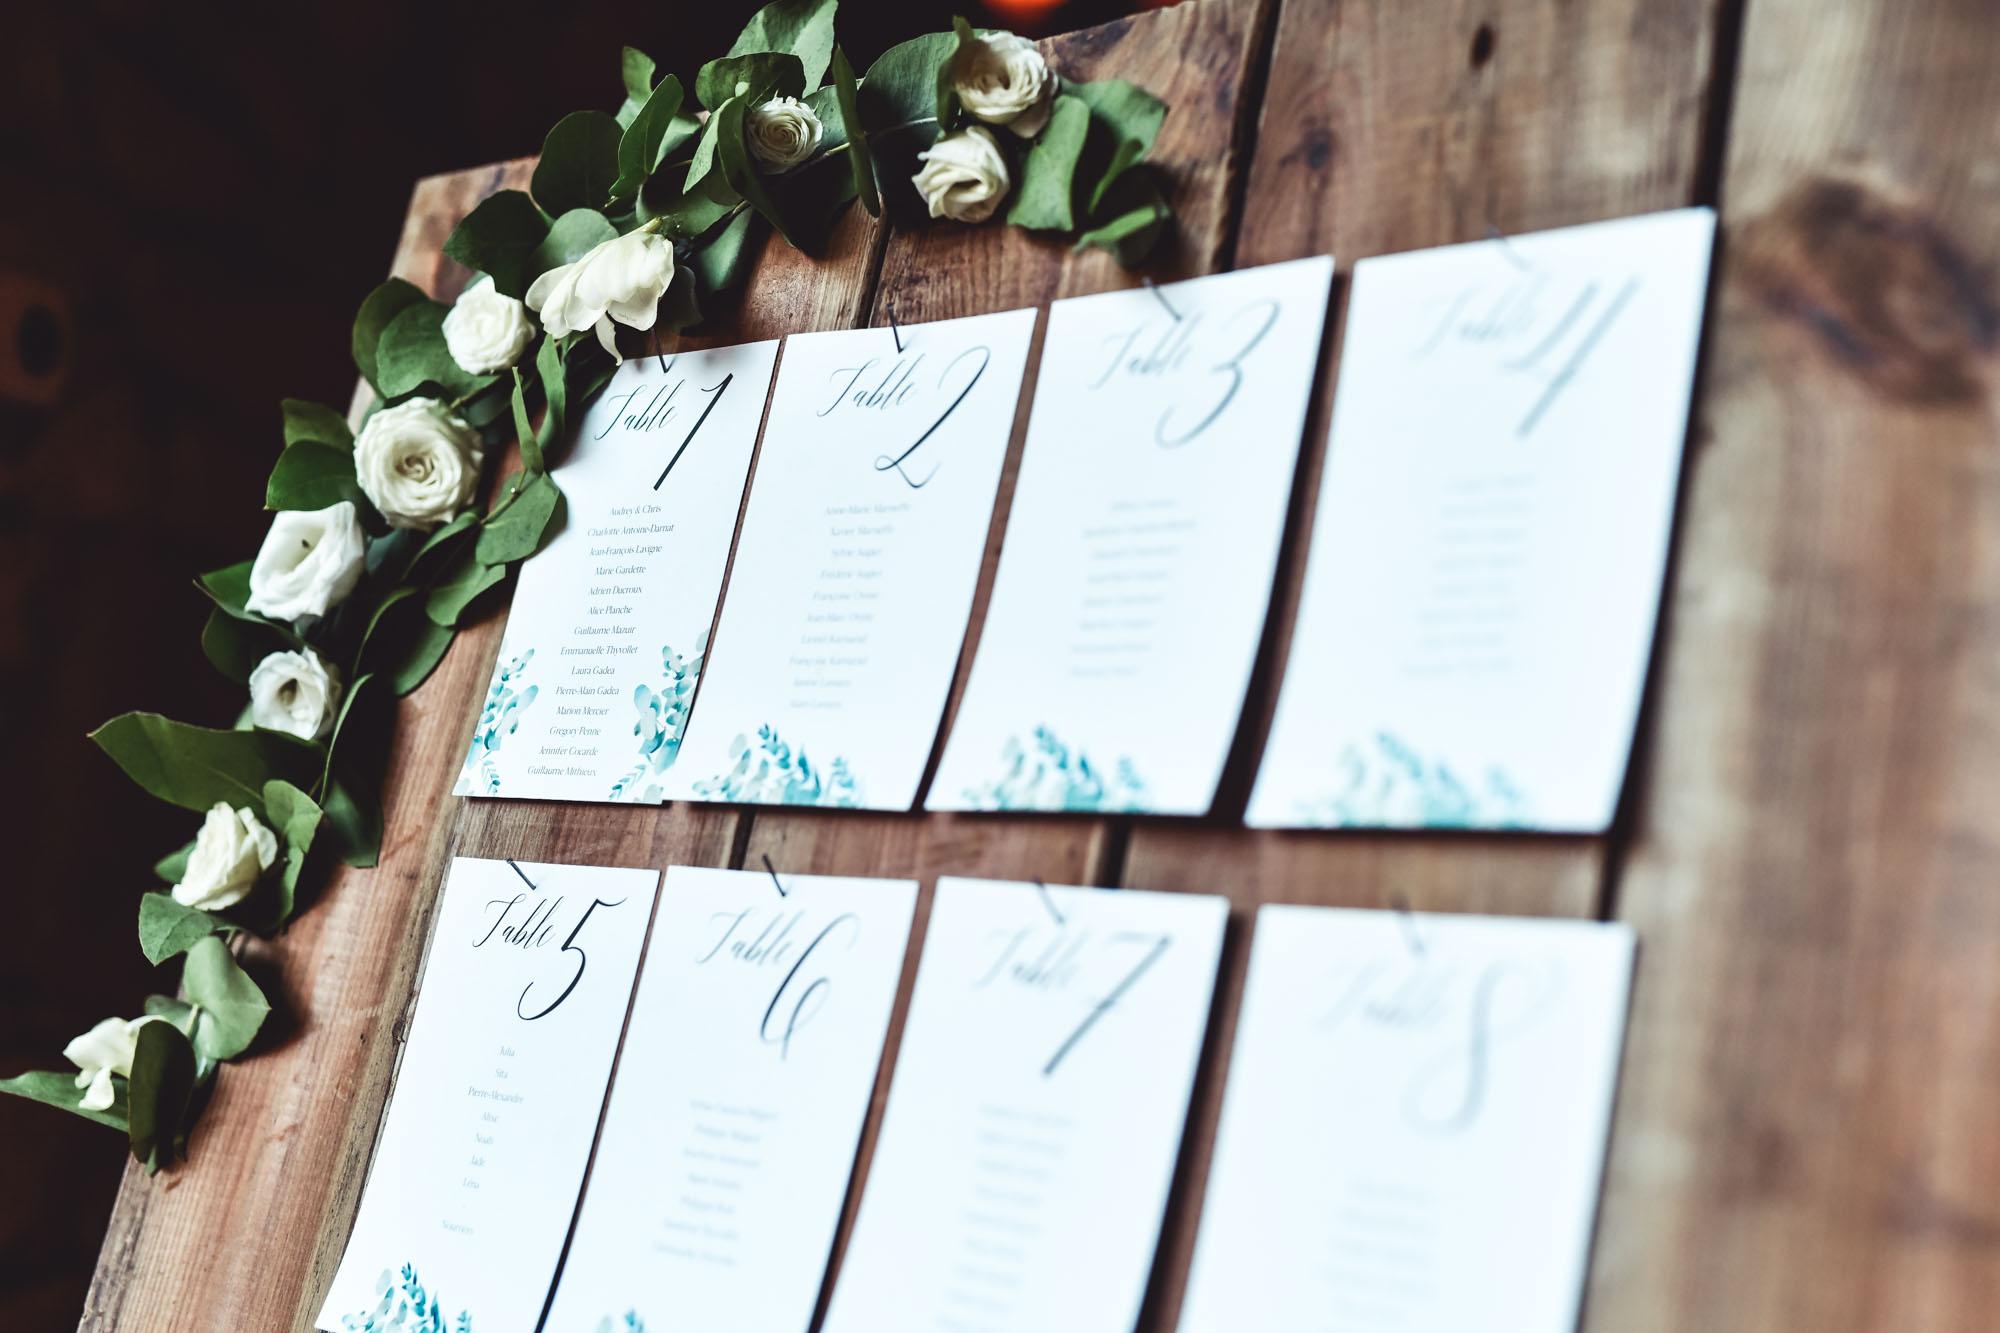 2018-07-21 - LD8_0723 - photographe mariage lyon - laurie diaz - www.lauriediazweeding.com.jpg